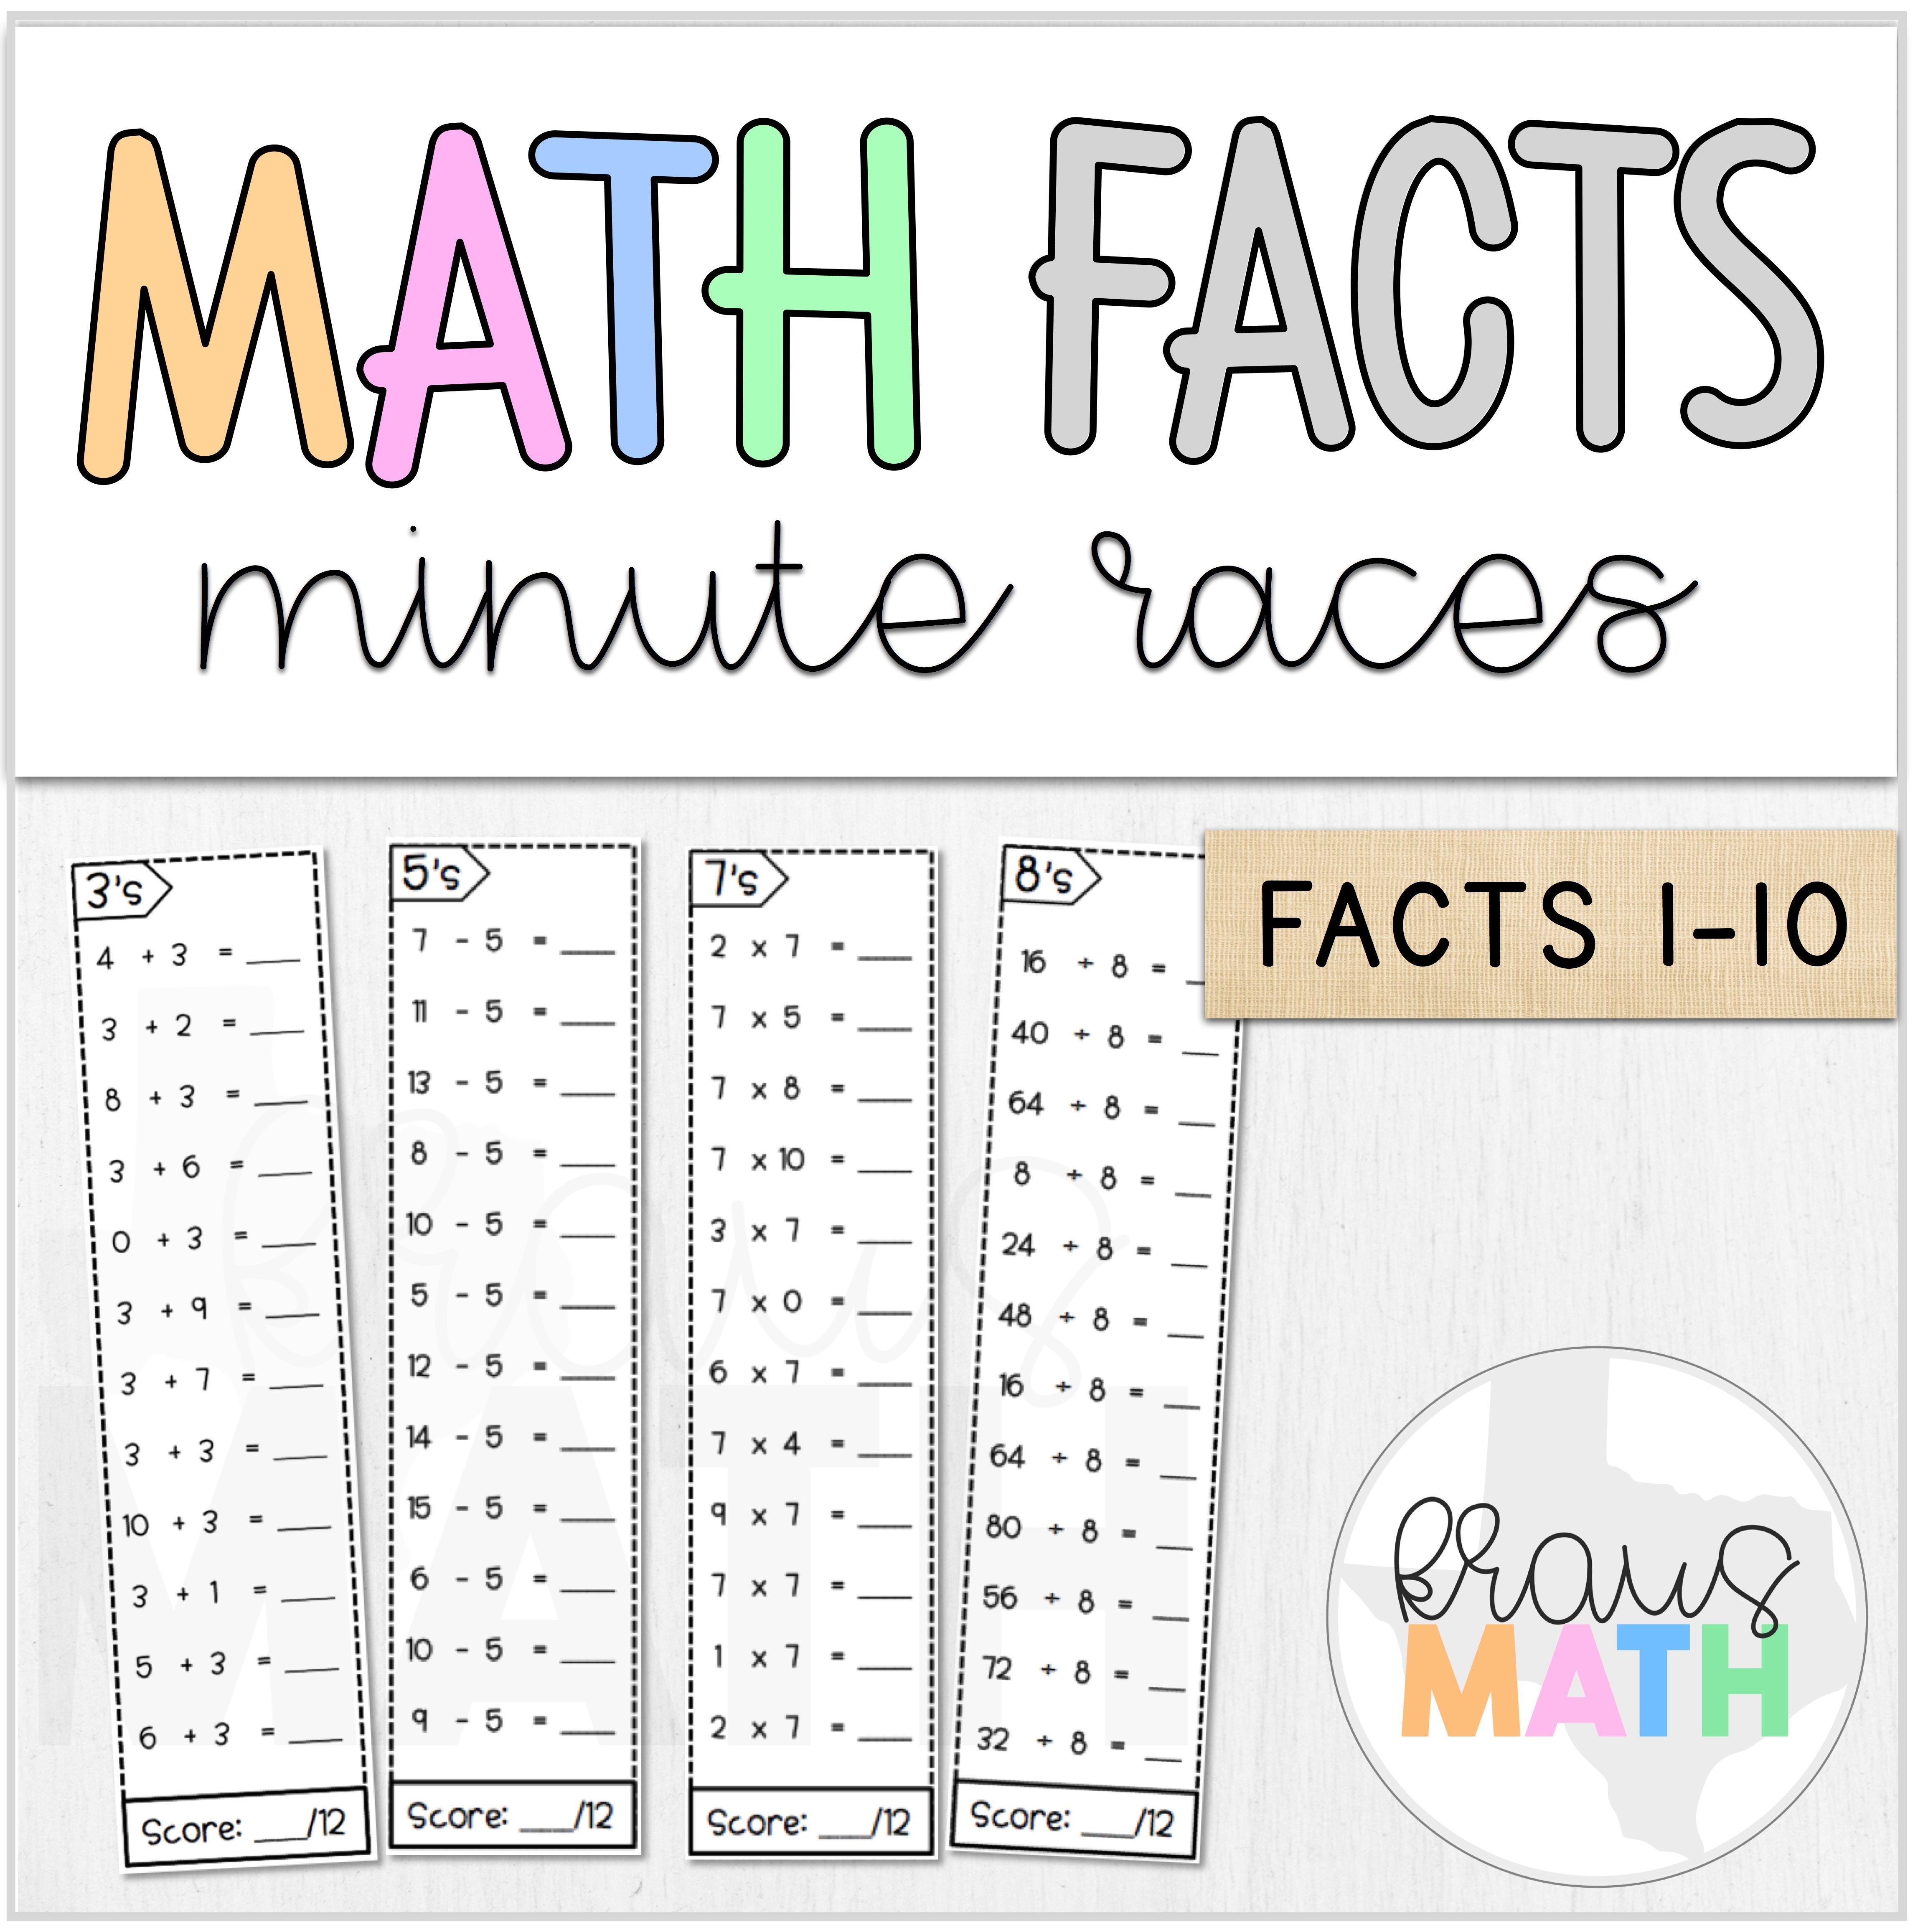 Math Facts Fluency   Minute Races BUNDLE (0-10)   Kraus Math   Math facts [ 4625 x 4603 Pixel ]